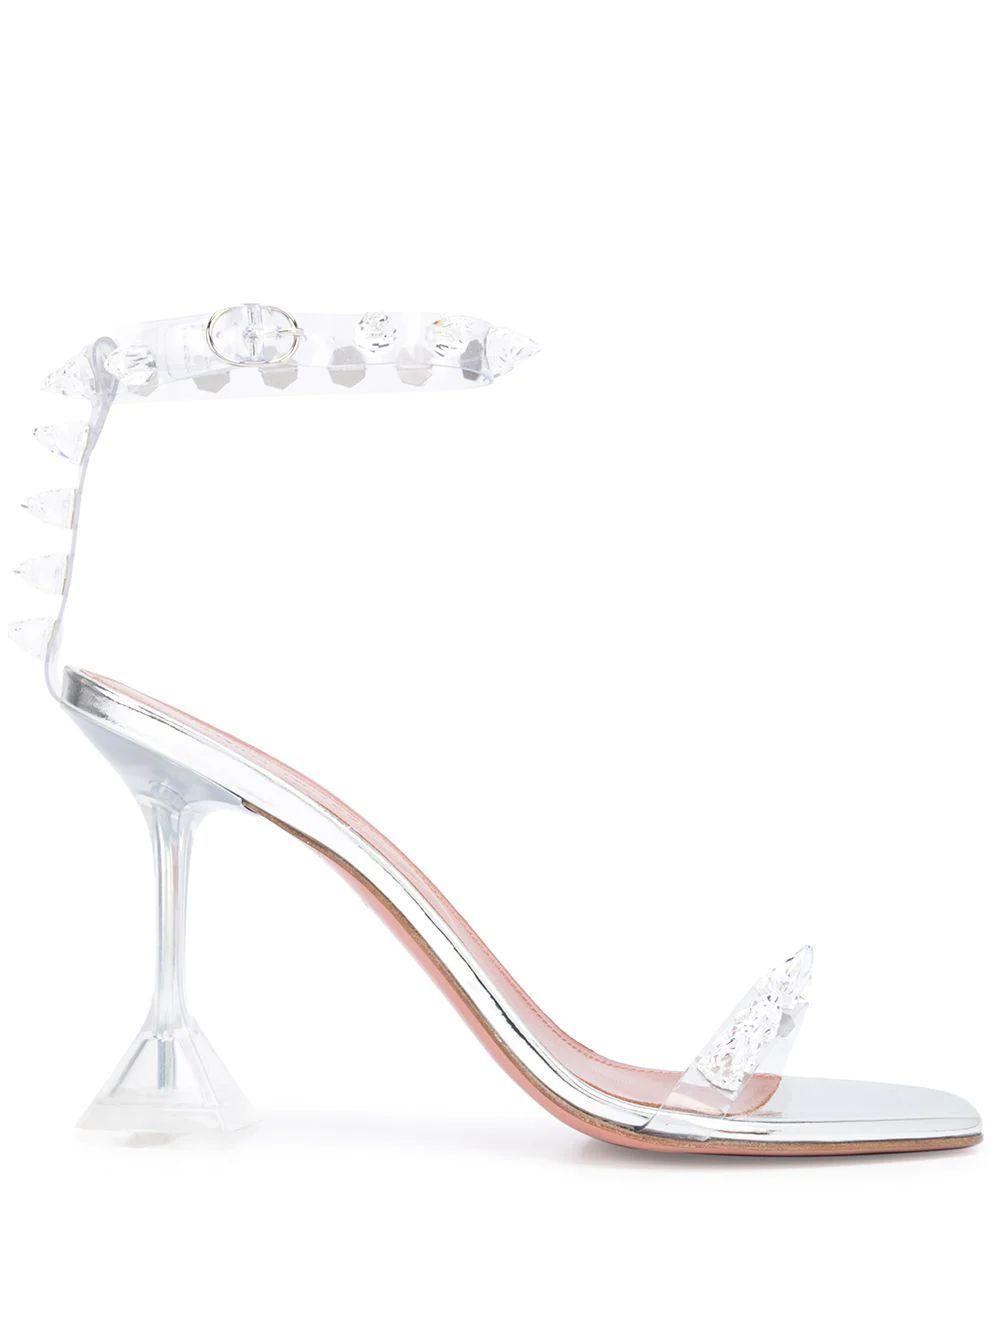 Julia Transparent 95mm Heel Item # JULIA-GLASS-CL